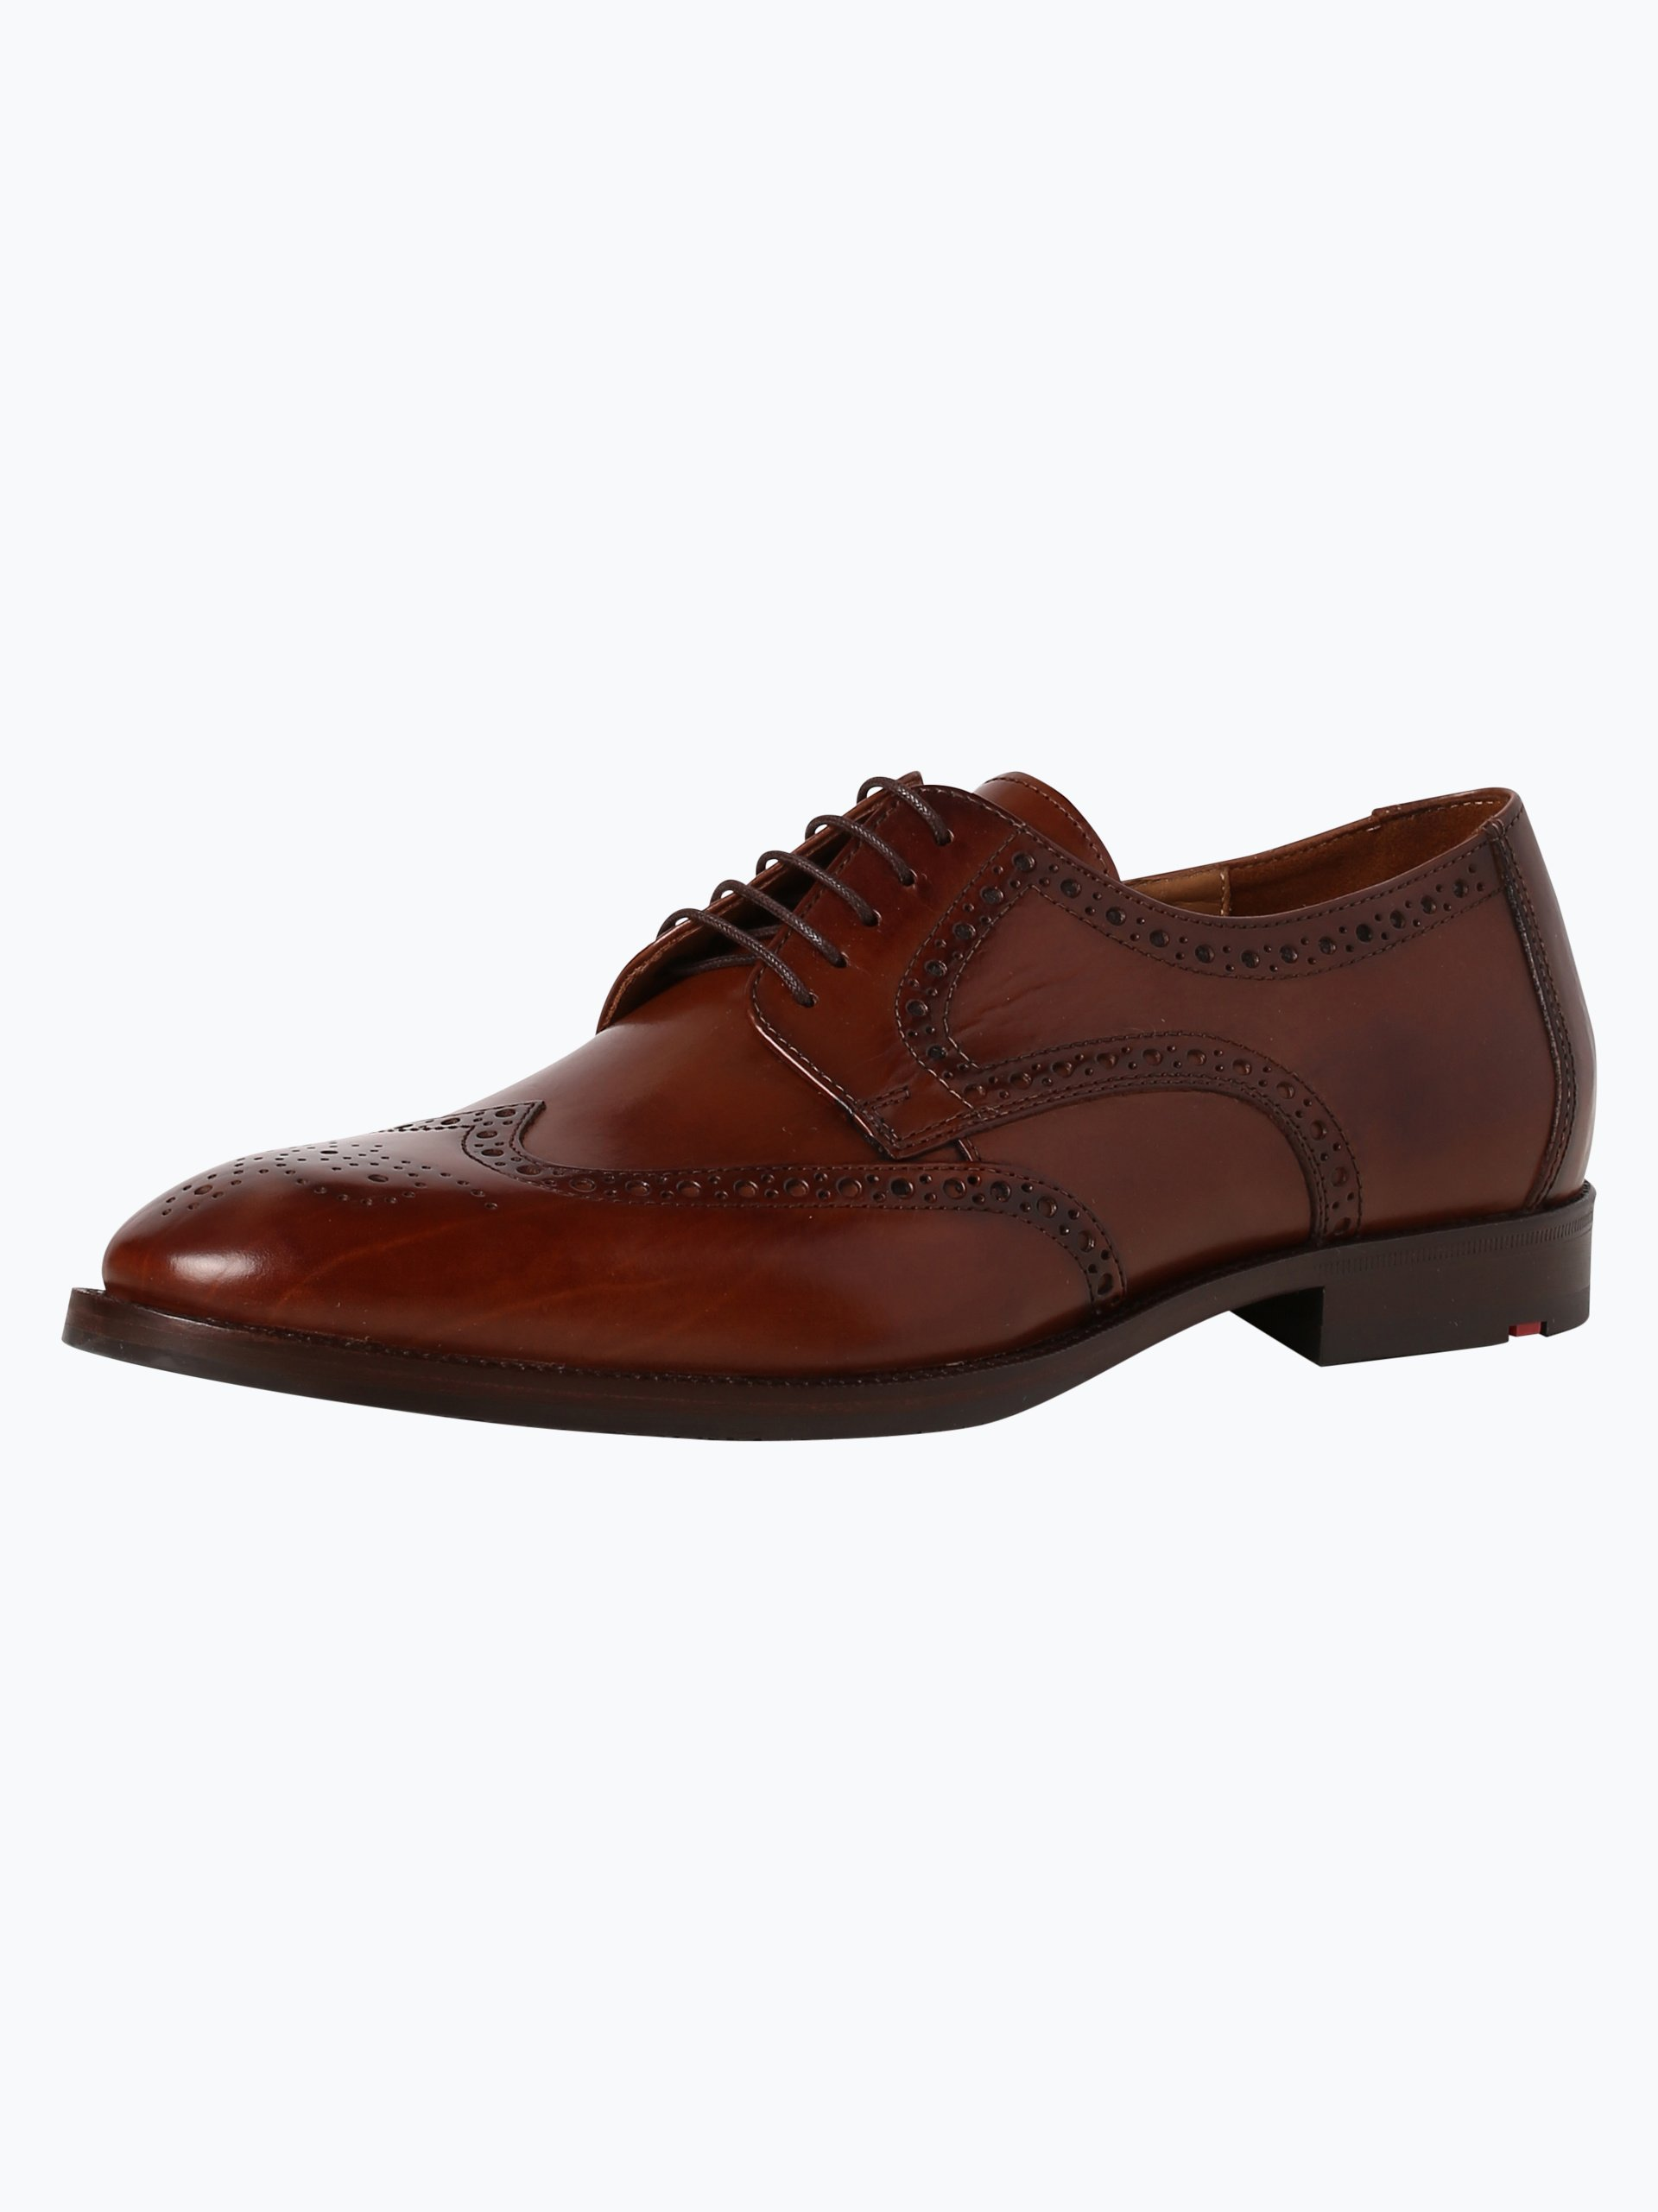 Lloyd Męskie buty sznurowane ze skóry – Lucien